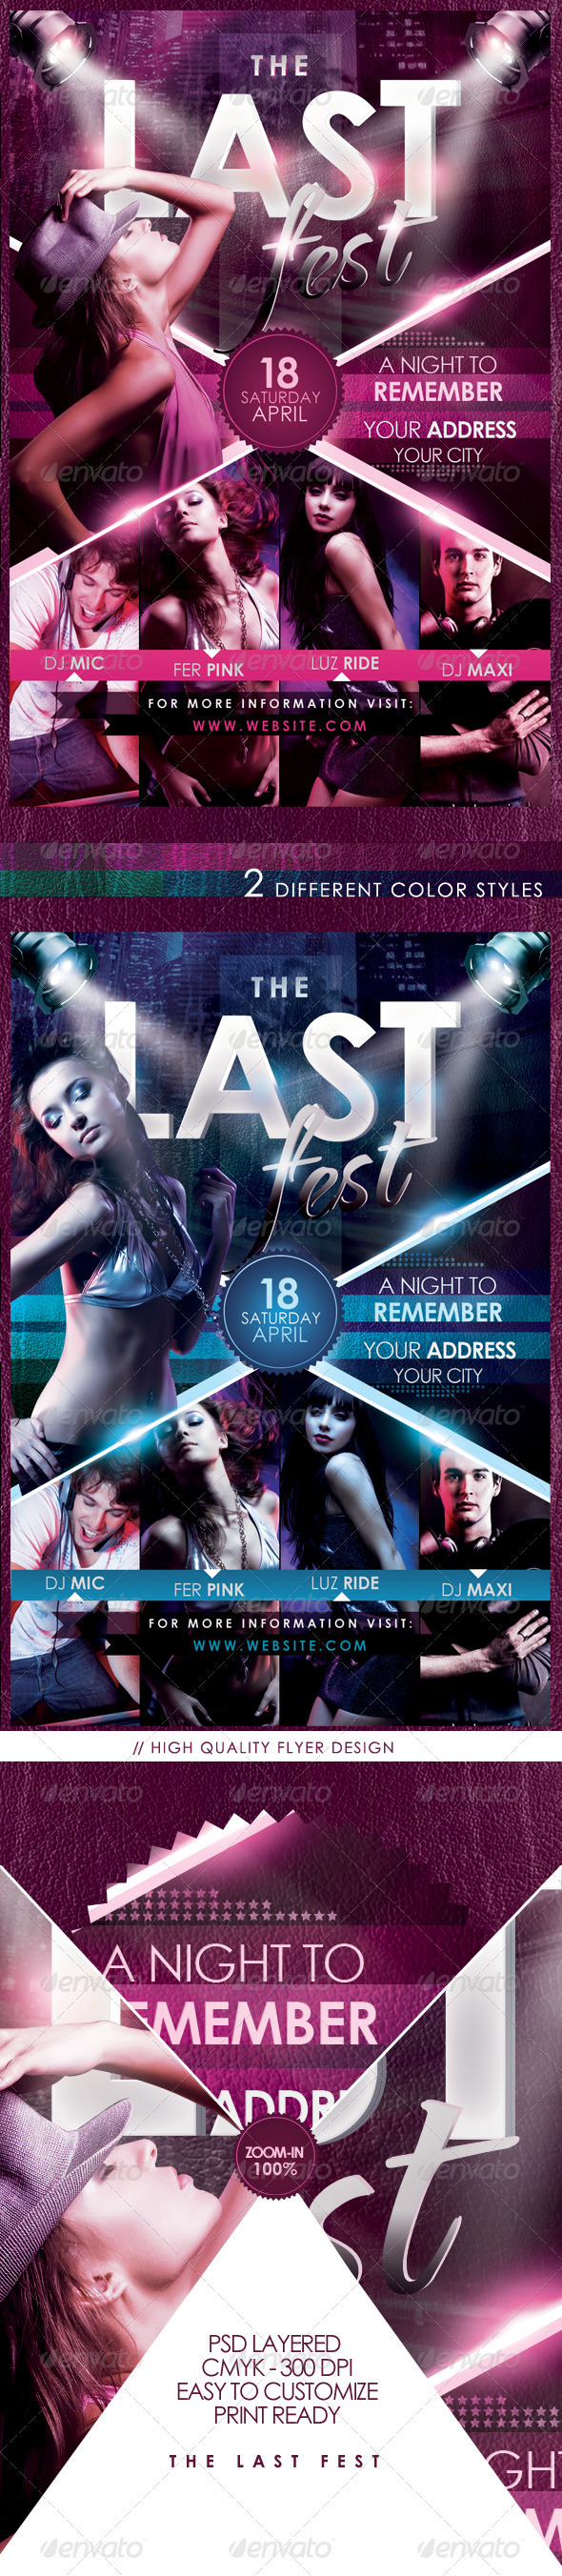 The Last Fest Flyer Template - Flyers Print Templates